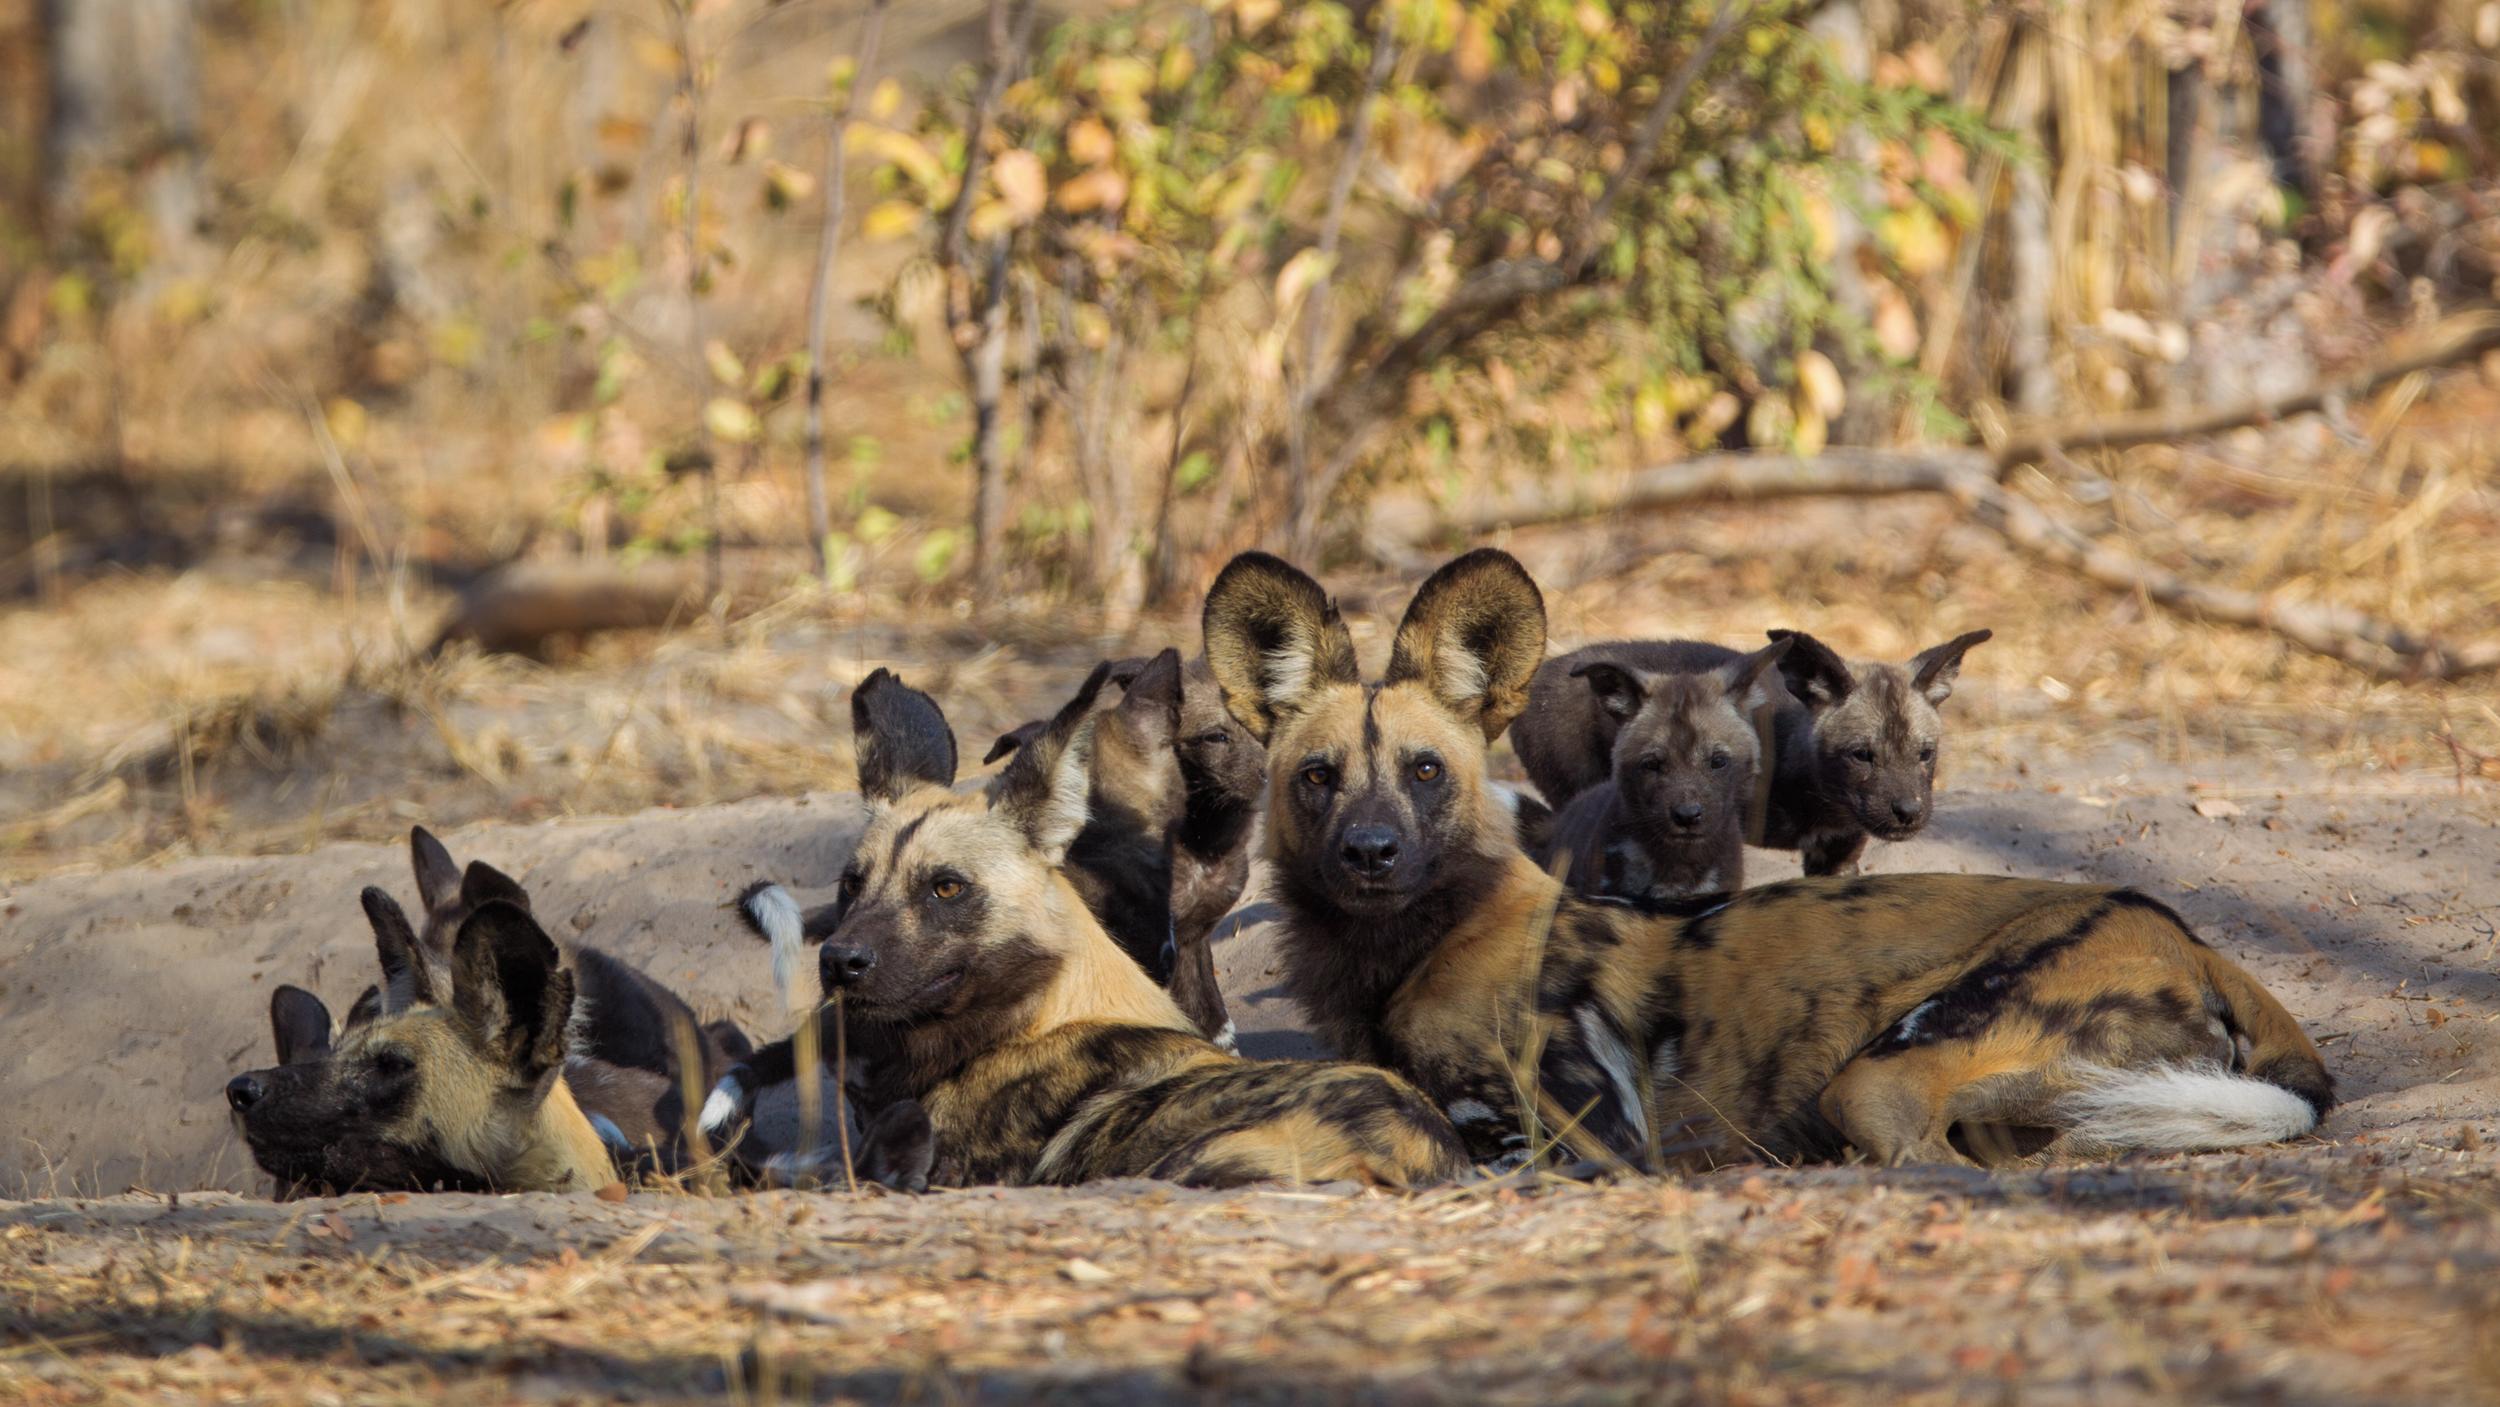 ©Will Burrard Lucas: Browny and his Nyamandlovu family